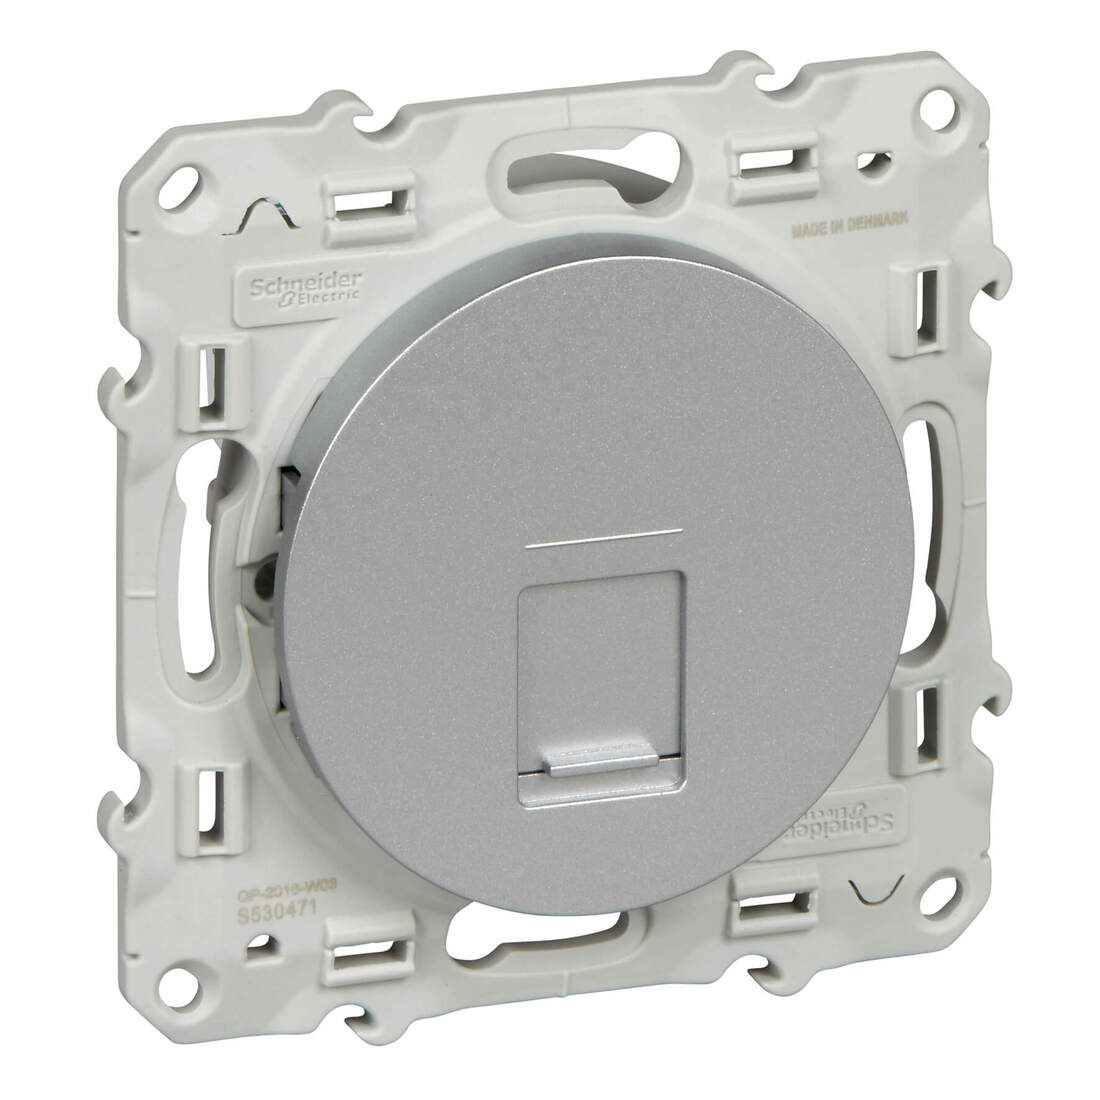 Schneider-Merten Odace contactdoos rj45 Cat5e aluminium (S530471)